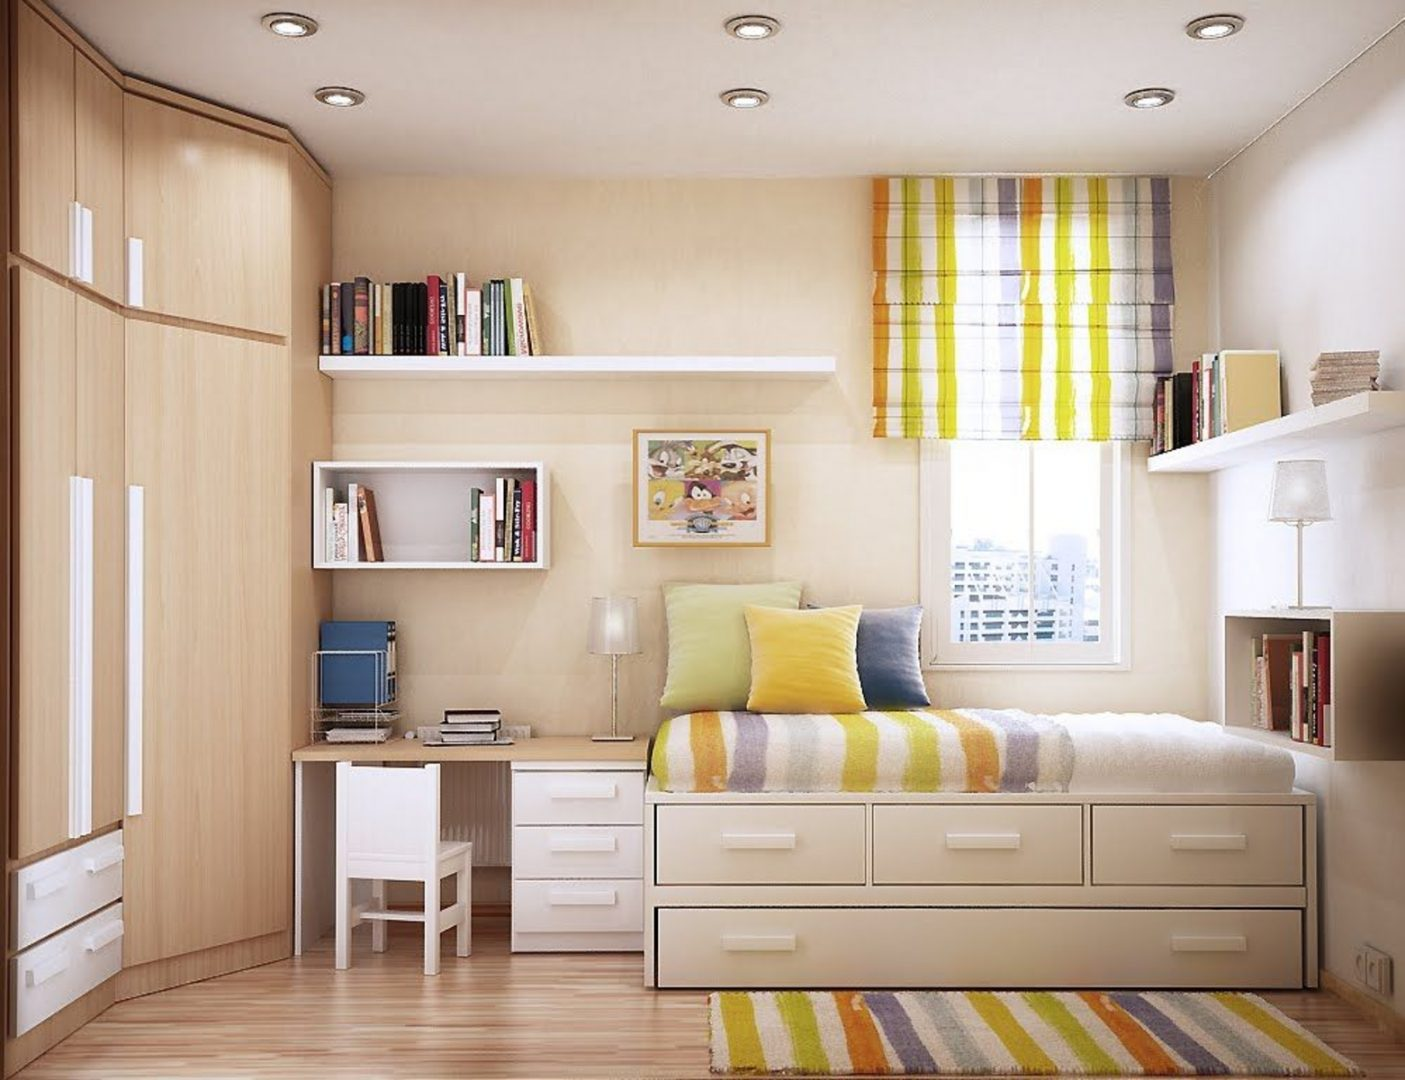 Decoraci n de una habitaci n juvenil im genes y fotos - Decoracion de una habitacion ...